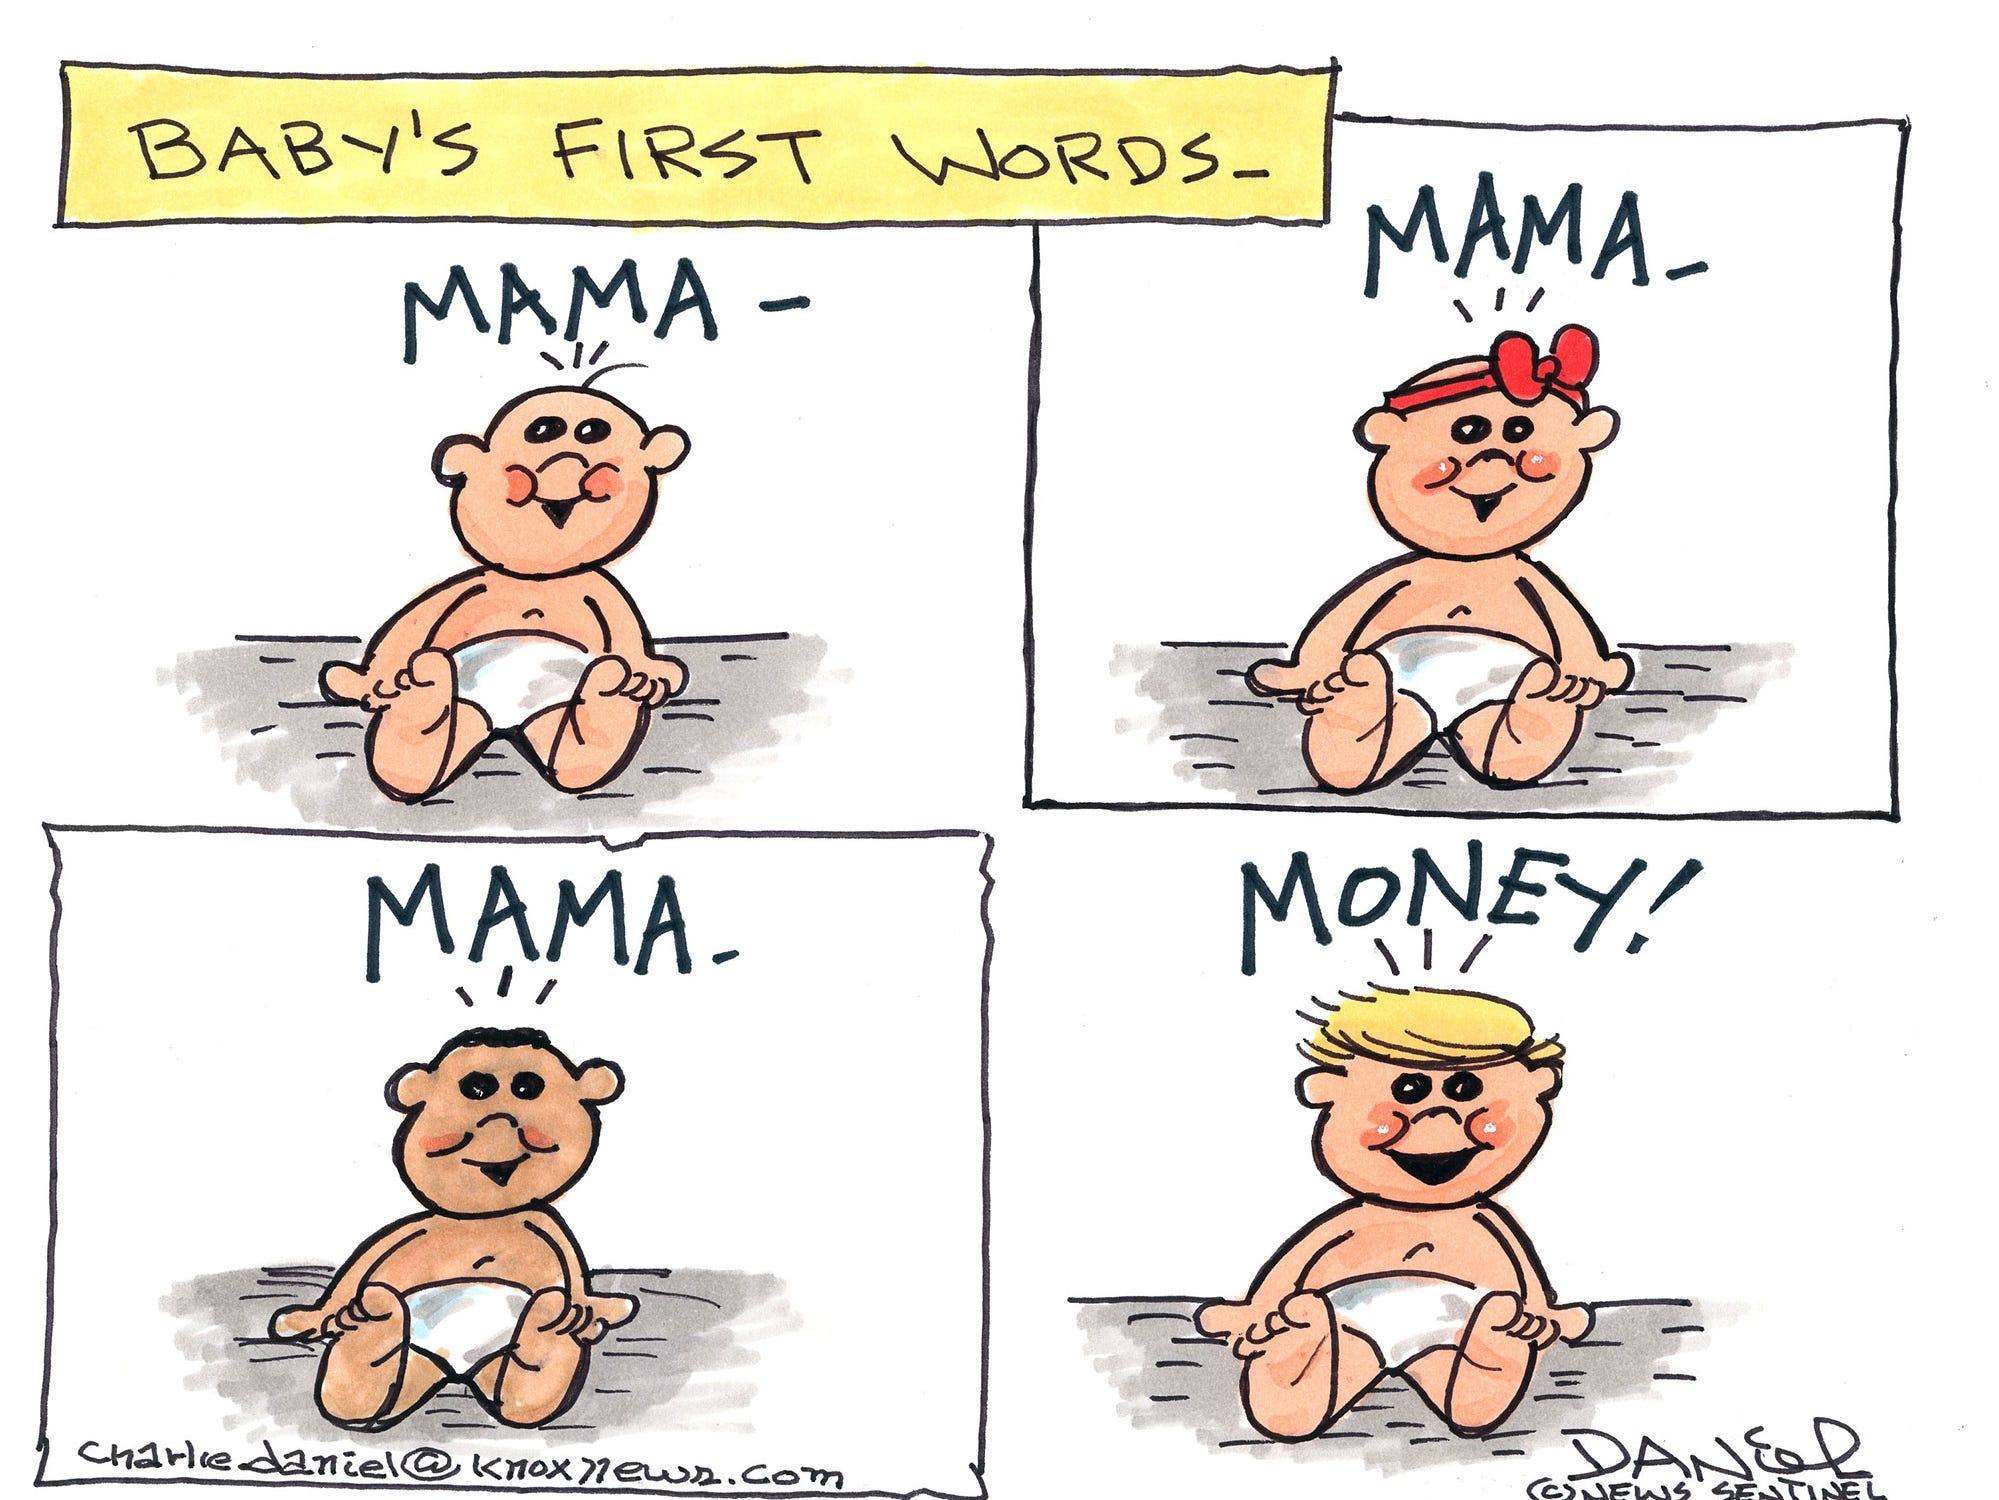 Charlie Daniel editorial cartoon for Friday, Oct. 5, 2018.